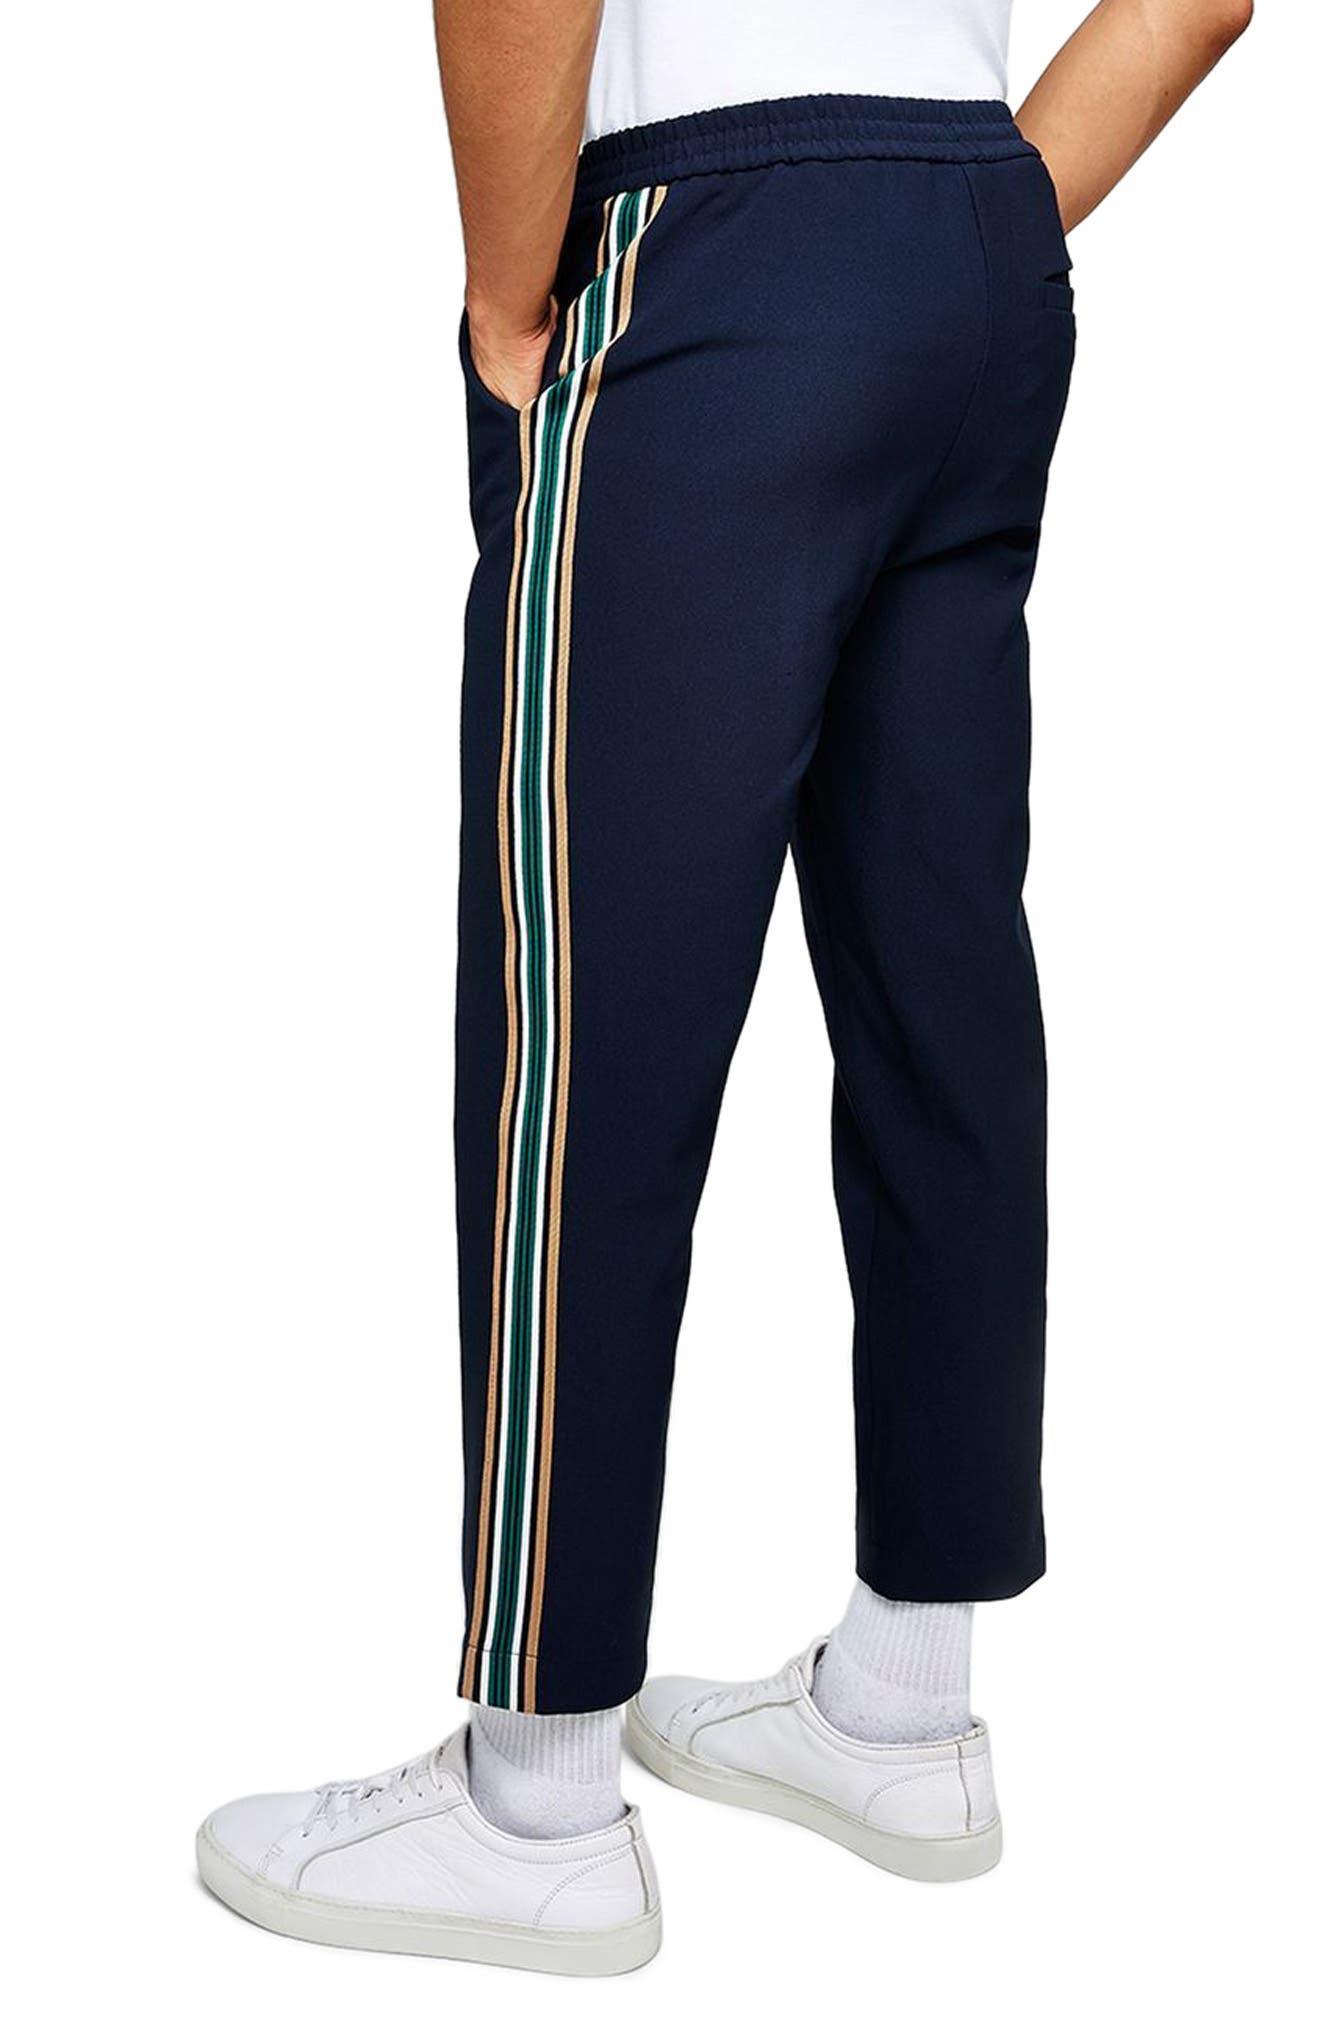 Cropped Slim Fit Jogger Pants,                             Main thumbnail 1, color,                             401